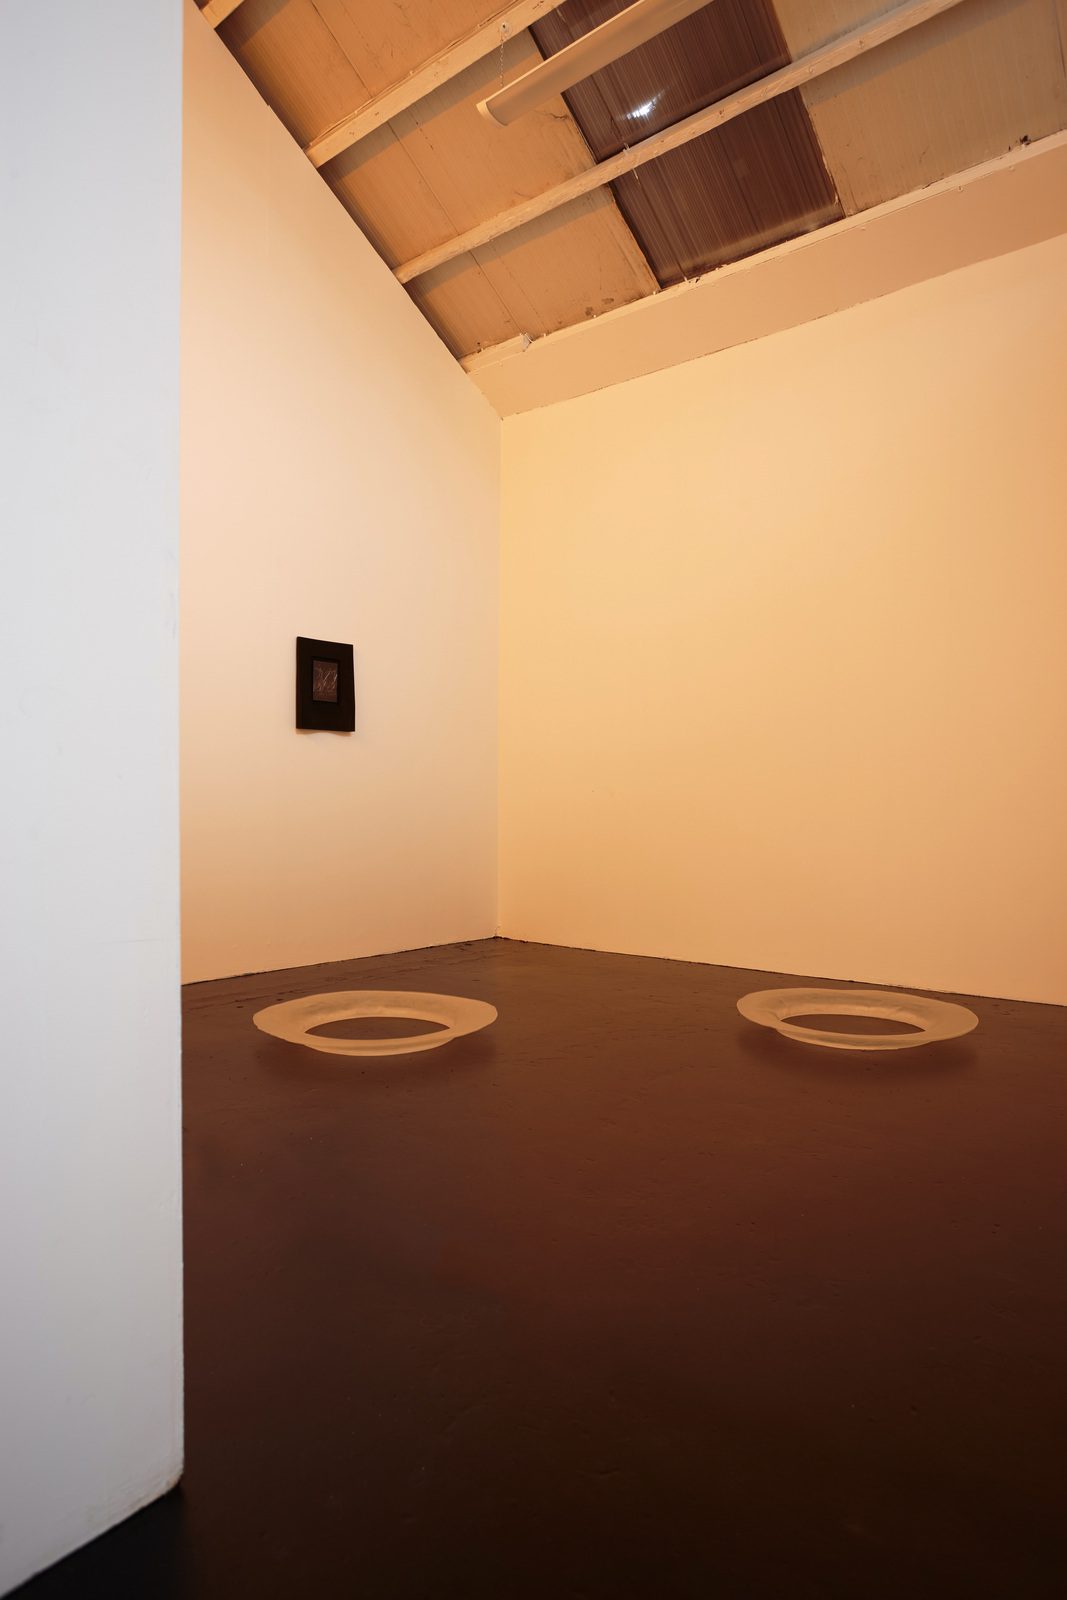 Ryan Estep - 5 - Installation View XIII